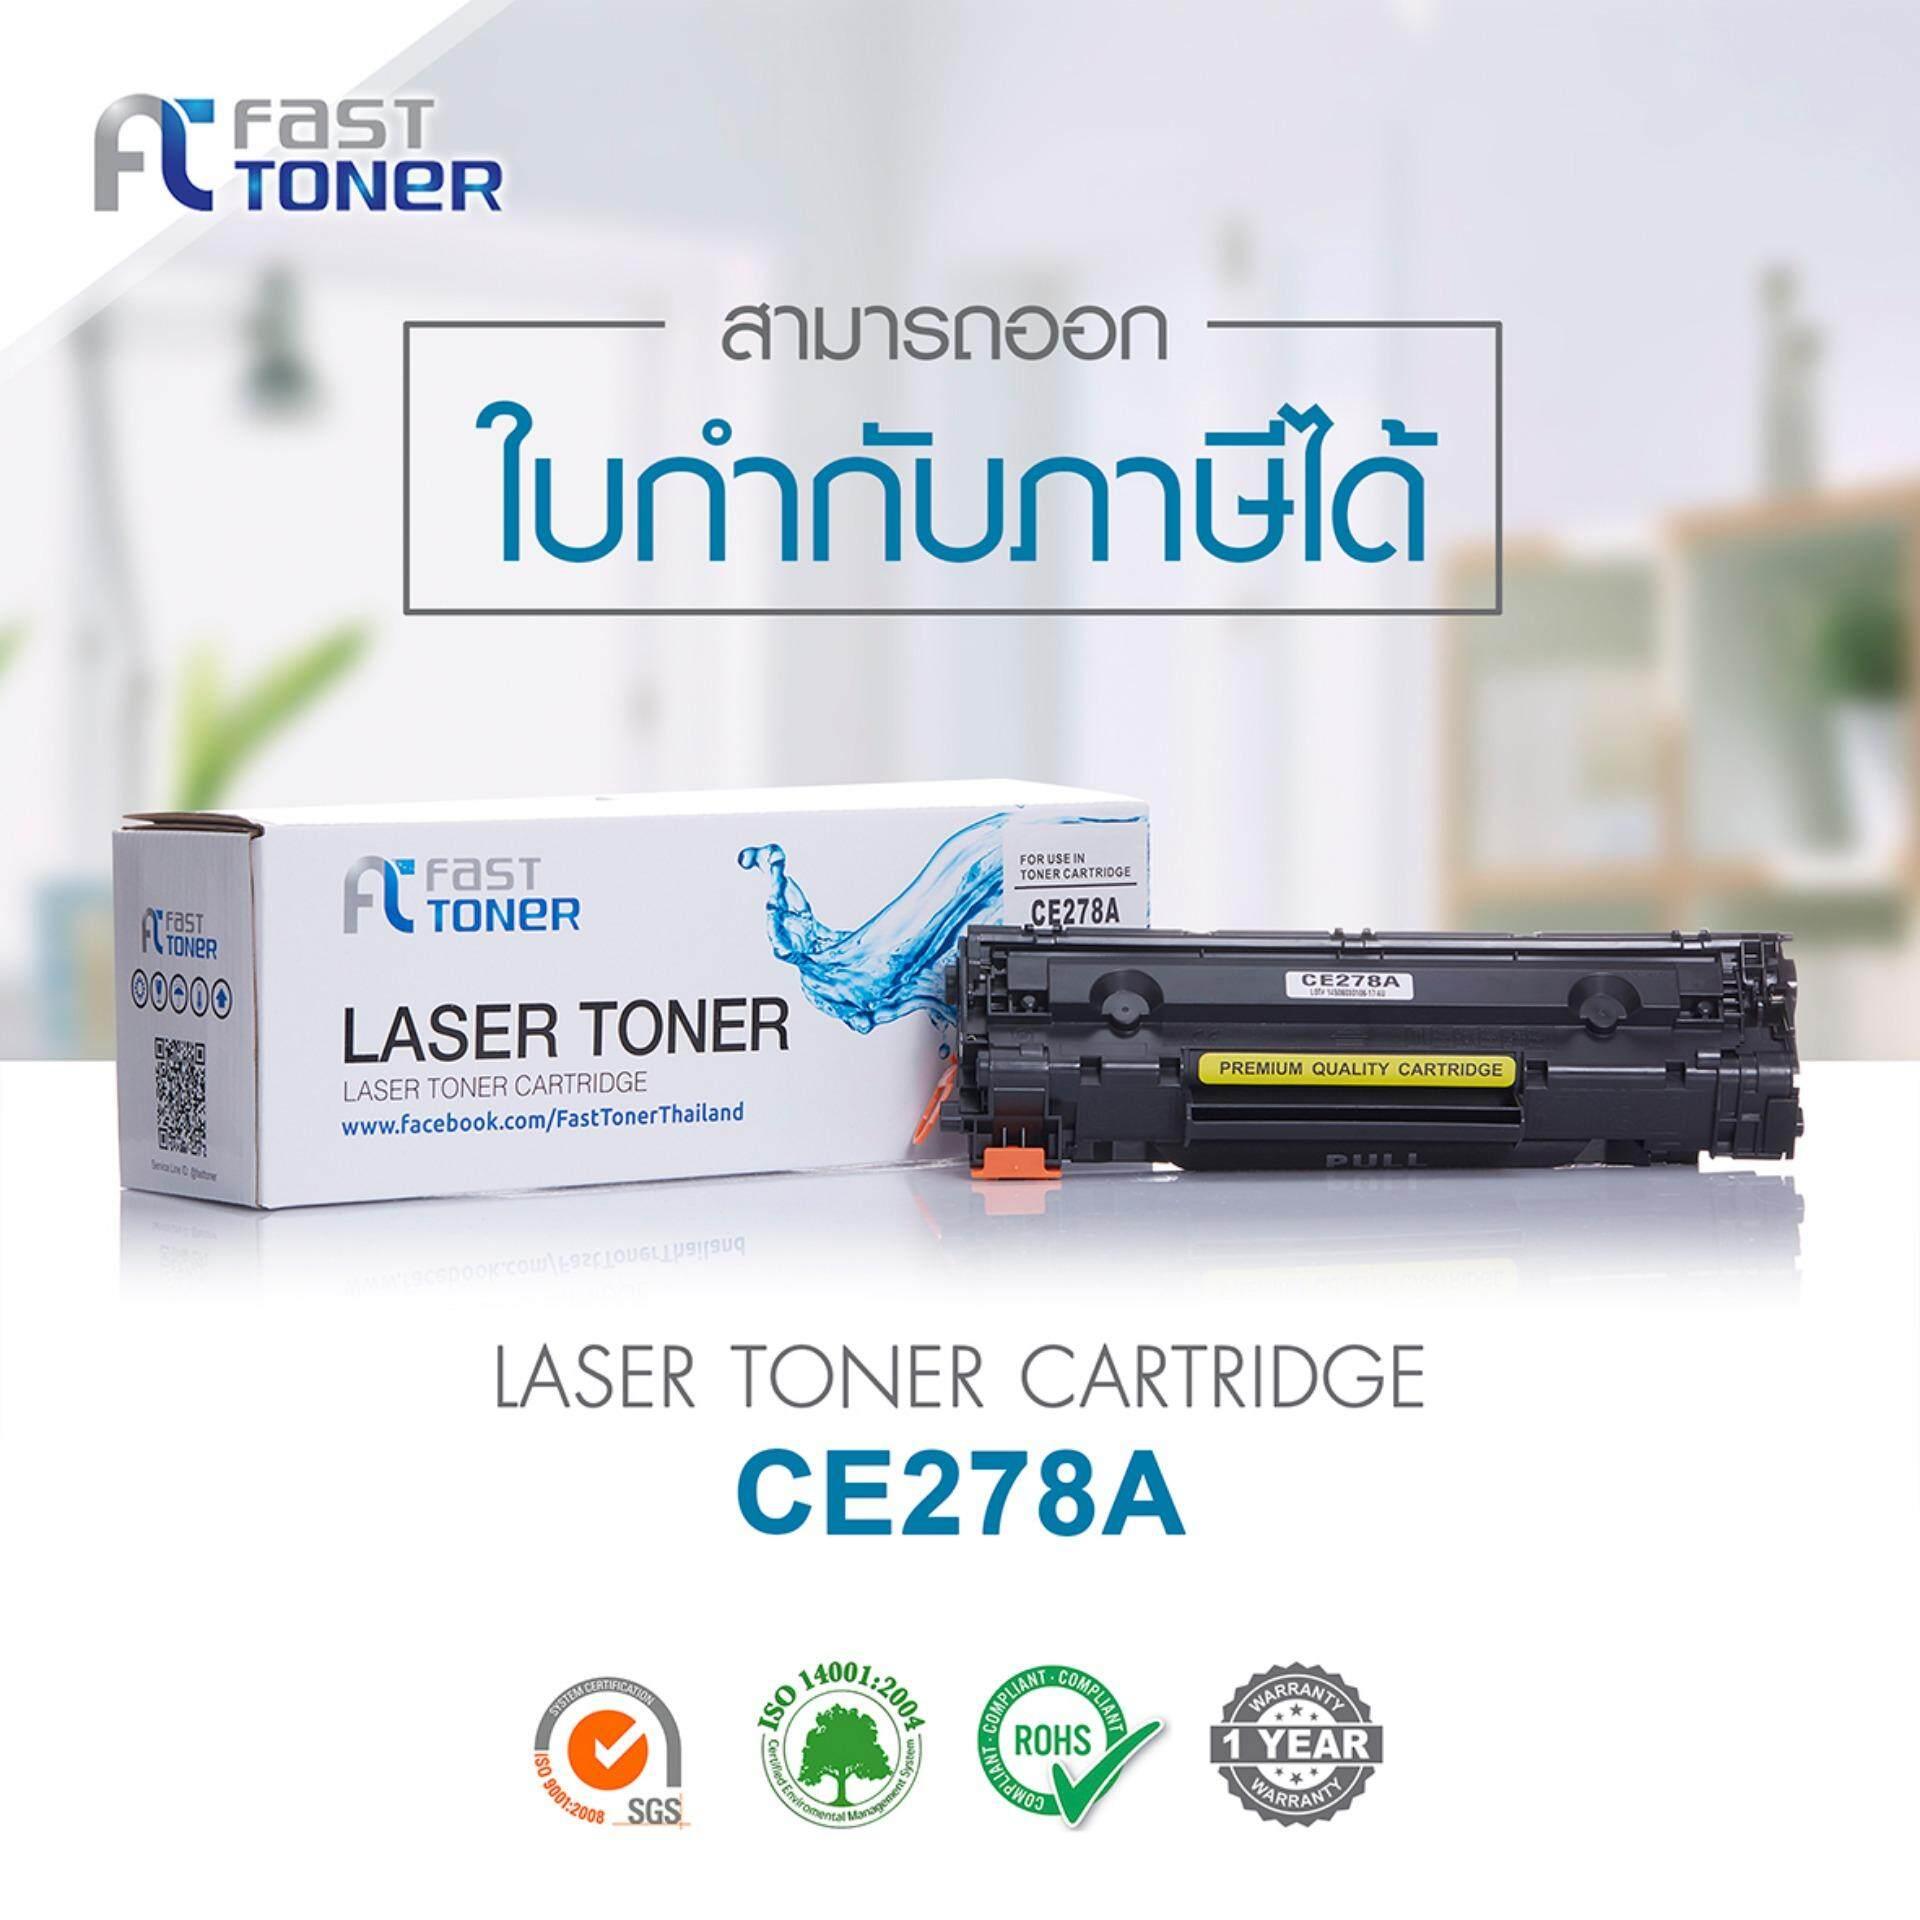 Fast Toner HP CE278A ( 78A ) สำหรับเครื่องปริ้น HP LaserJet Pro P1560/ P1566/ P1600/ P1606dn/ M1536dnf (Black)